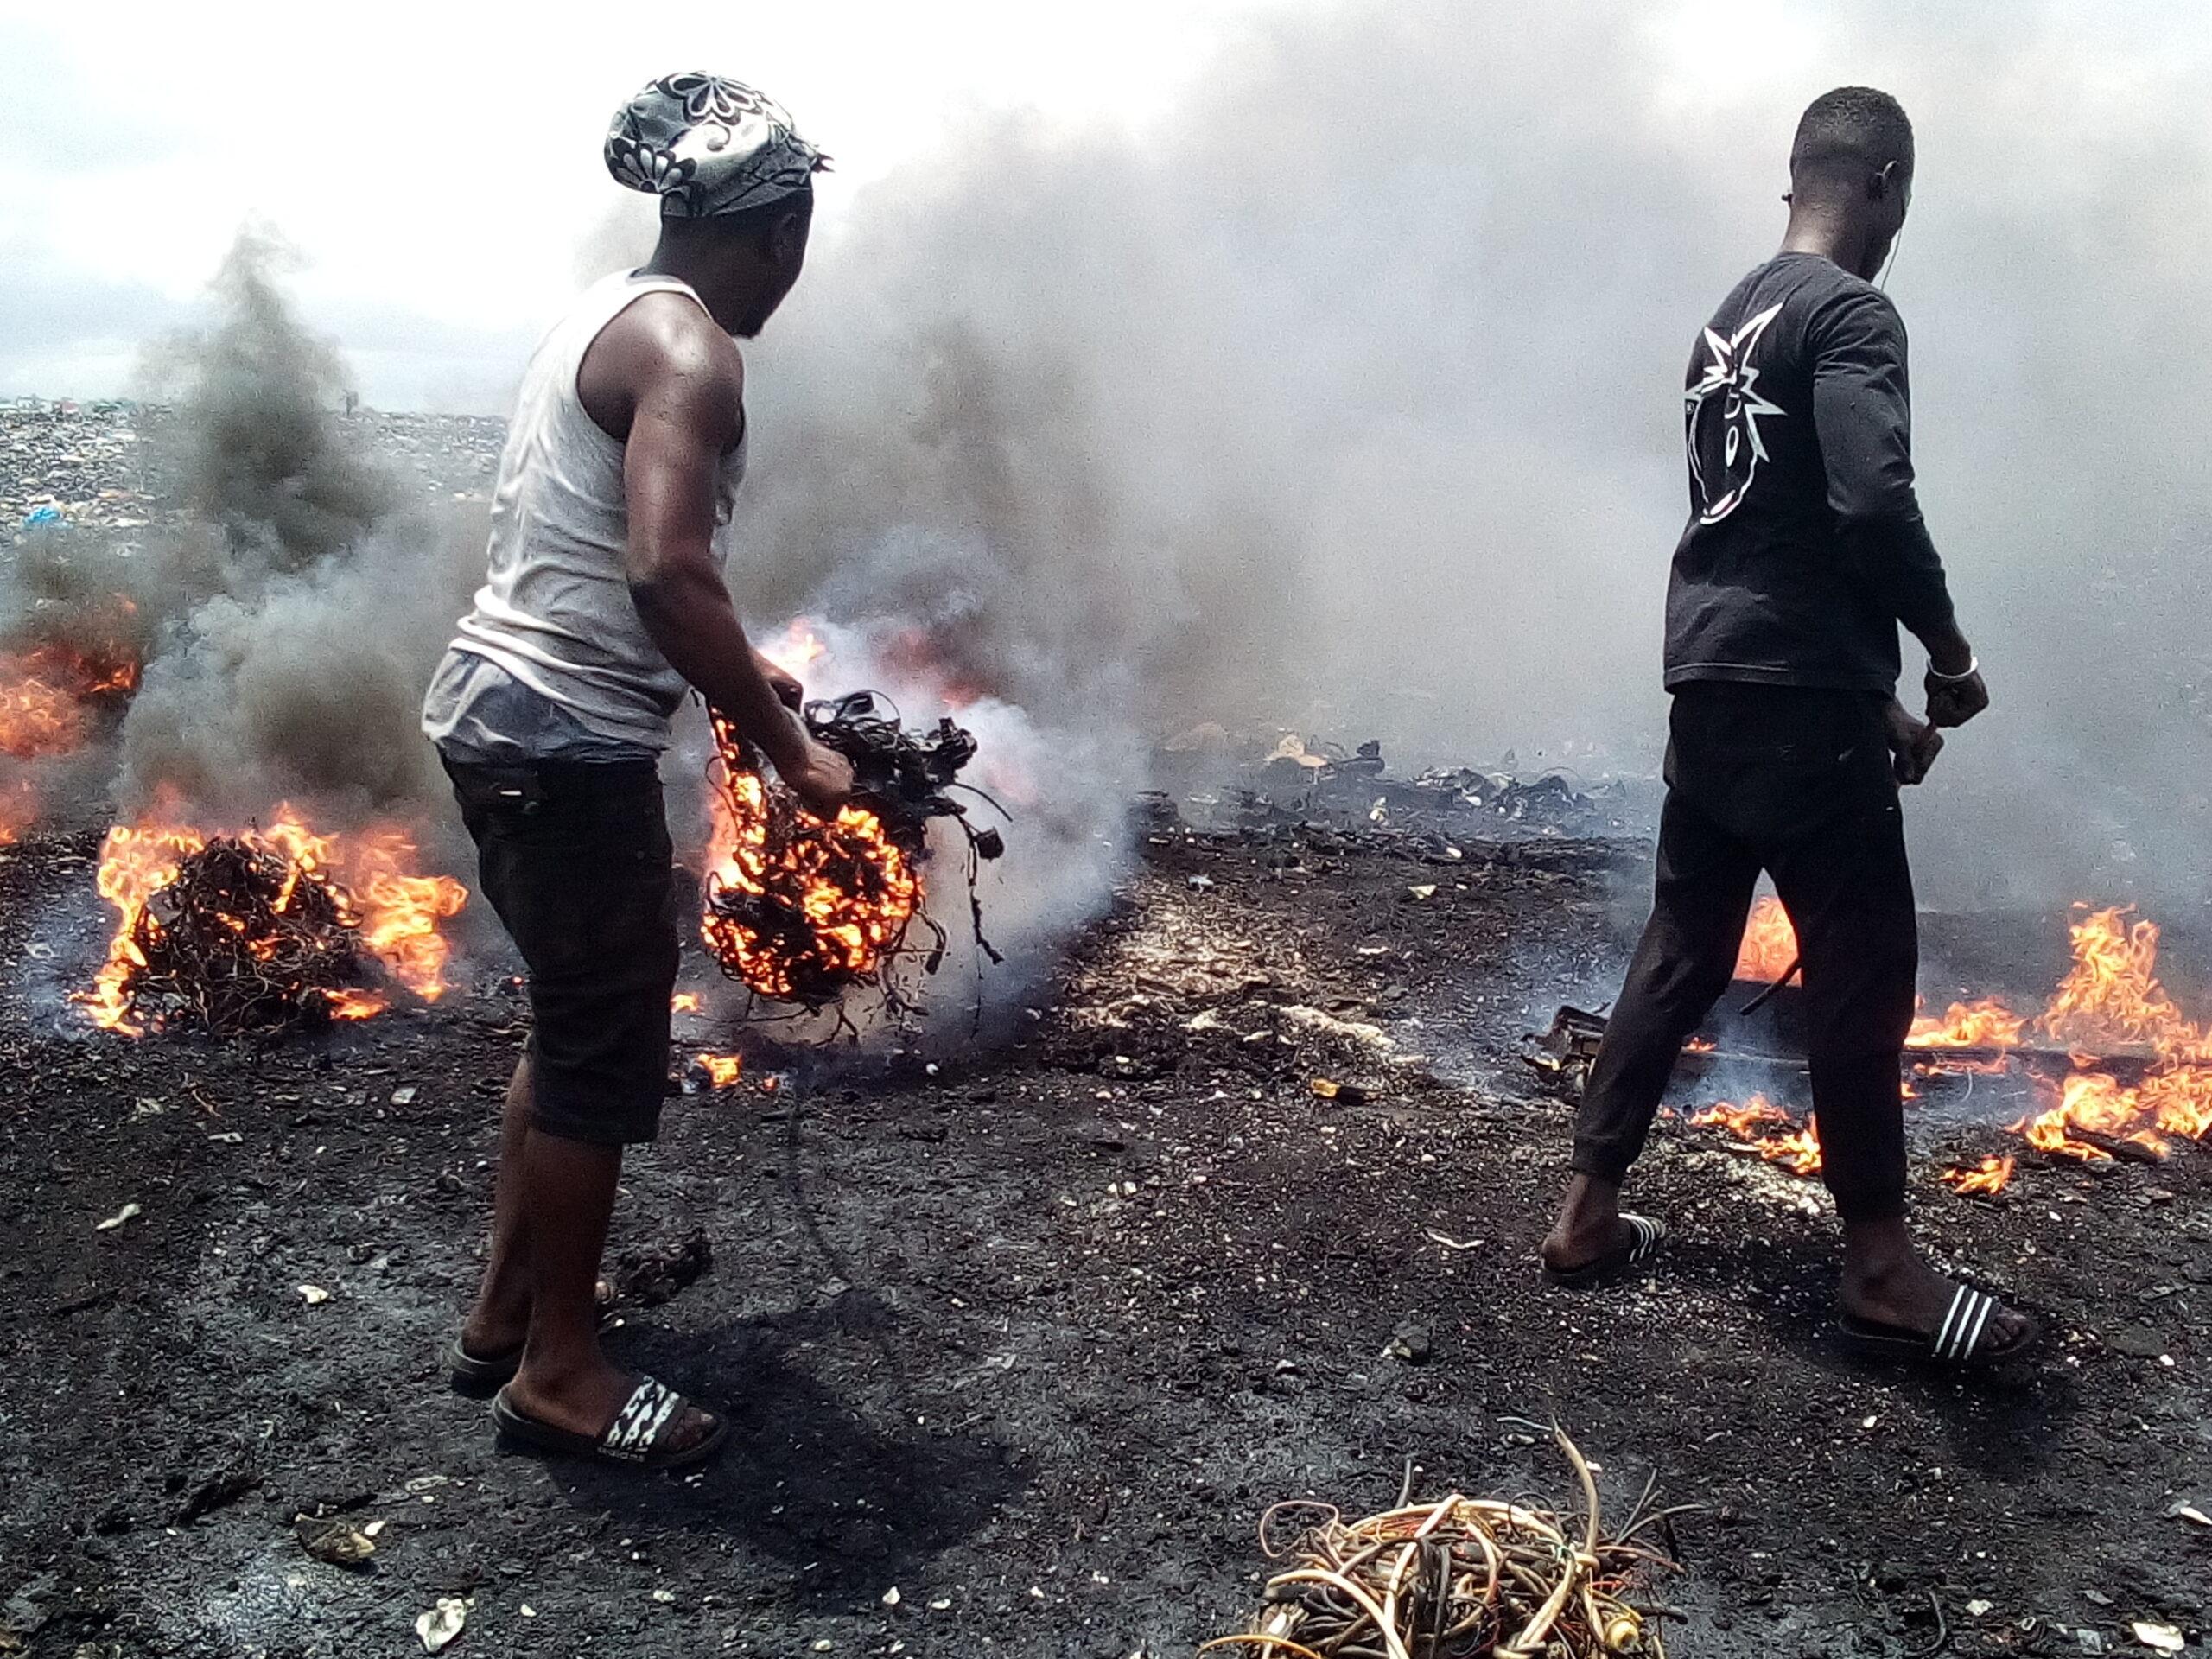 Agbogbloshie Ghana vertedero electrónico quema cables